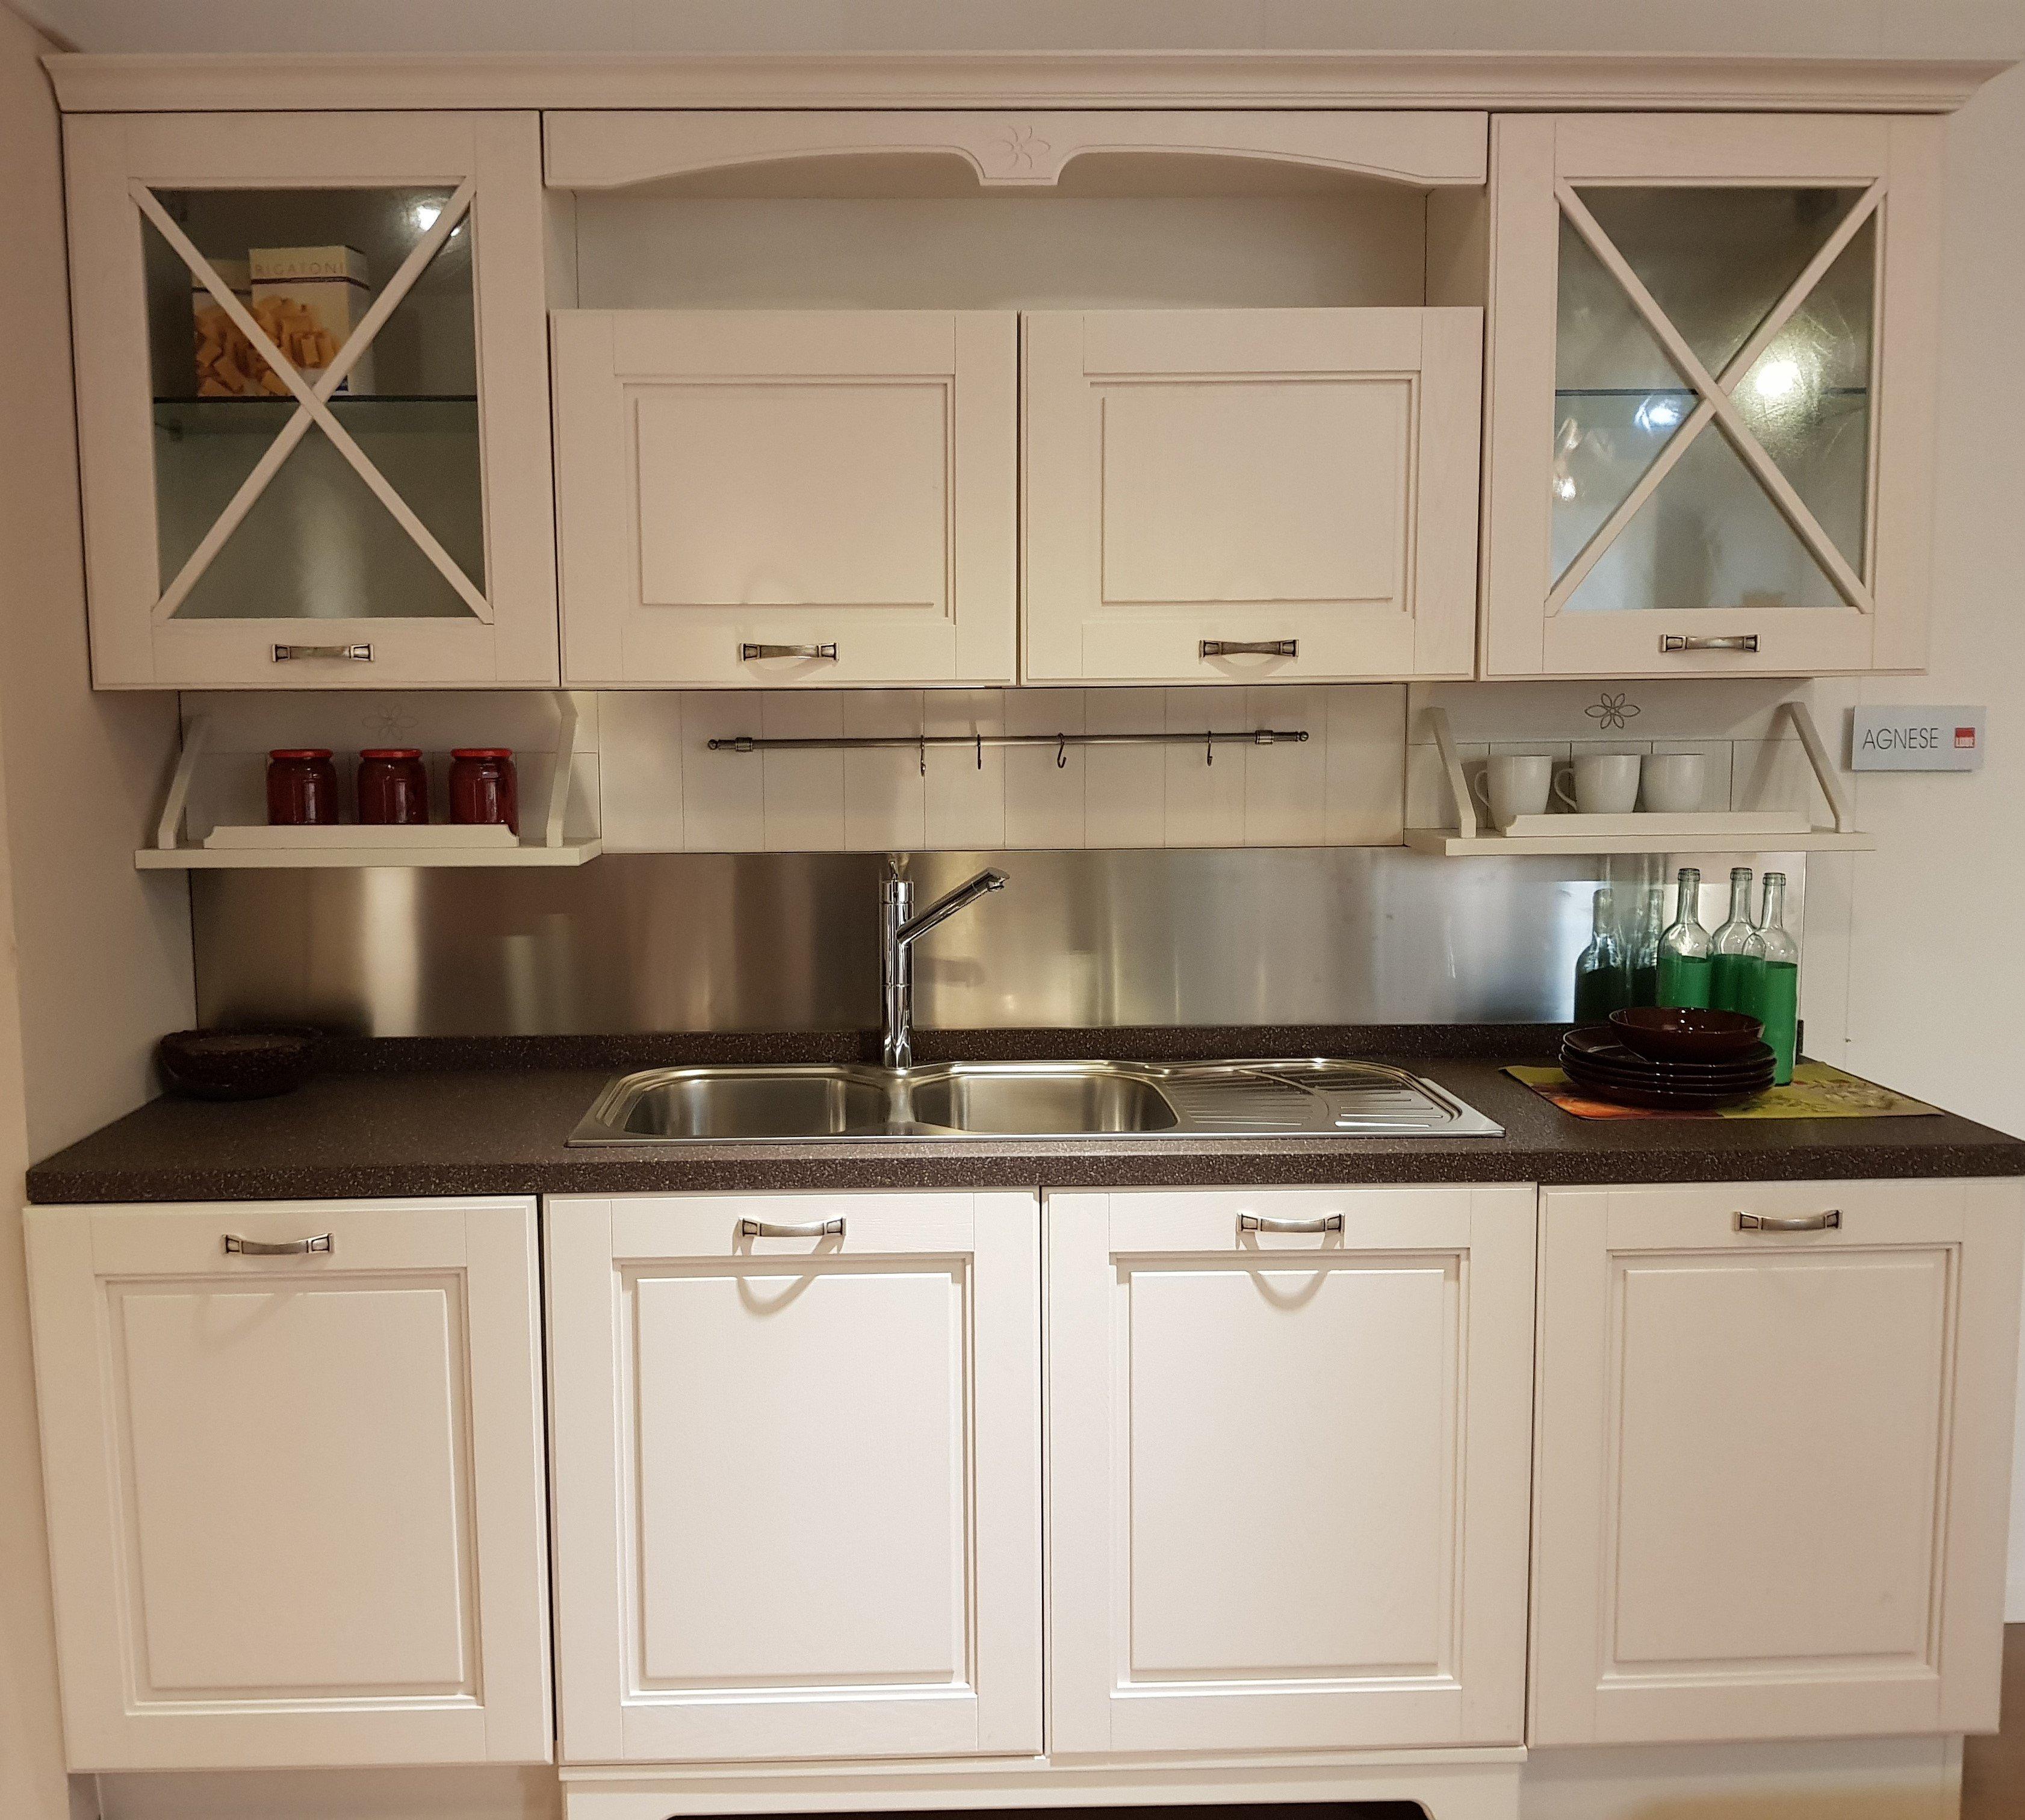 Cucina lube agnese bianco camelia vissani casa - Cucina lube agnese ...